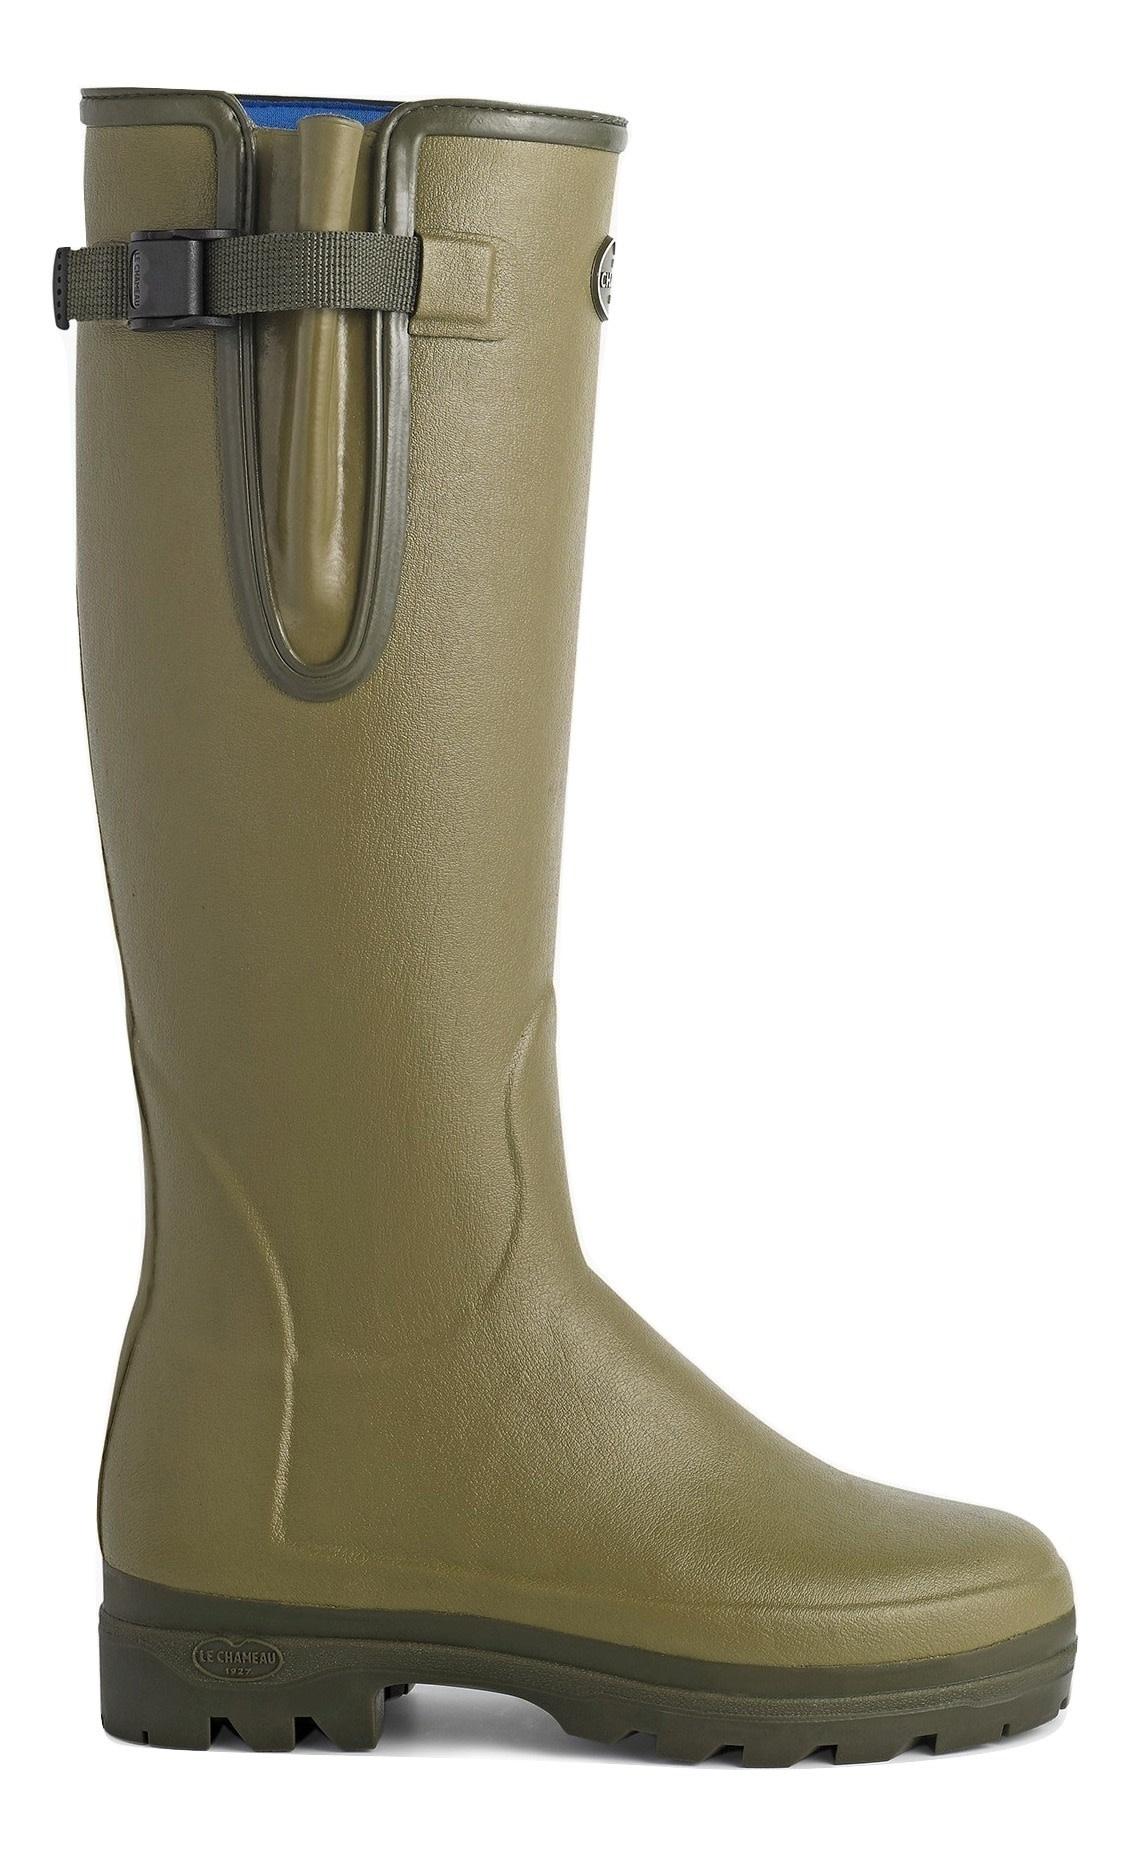 Le Chameau Women's Vierzonord Neoprene Lined Boot Vert Vierzon-2